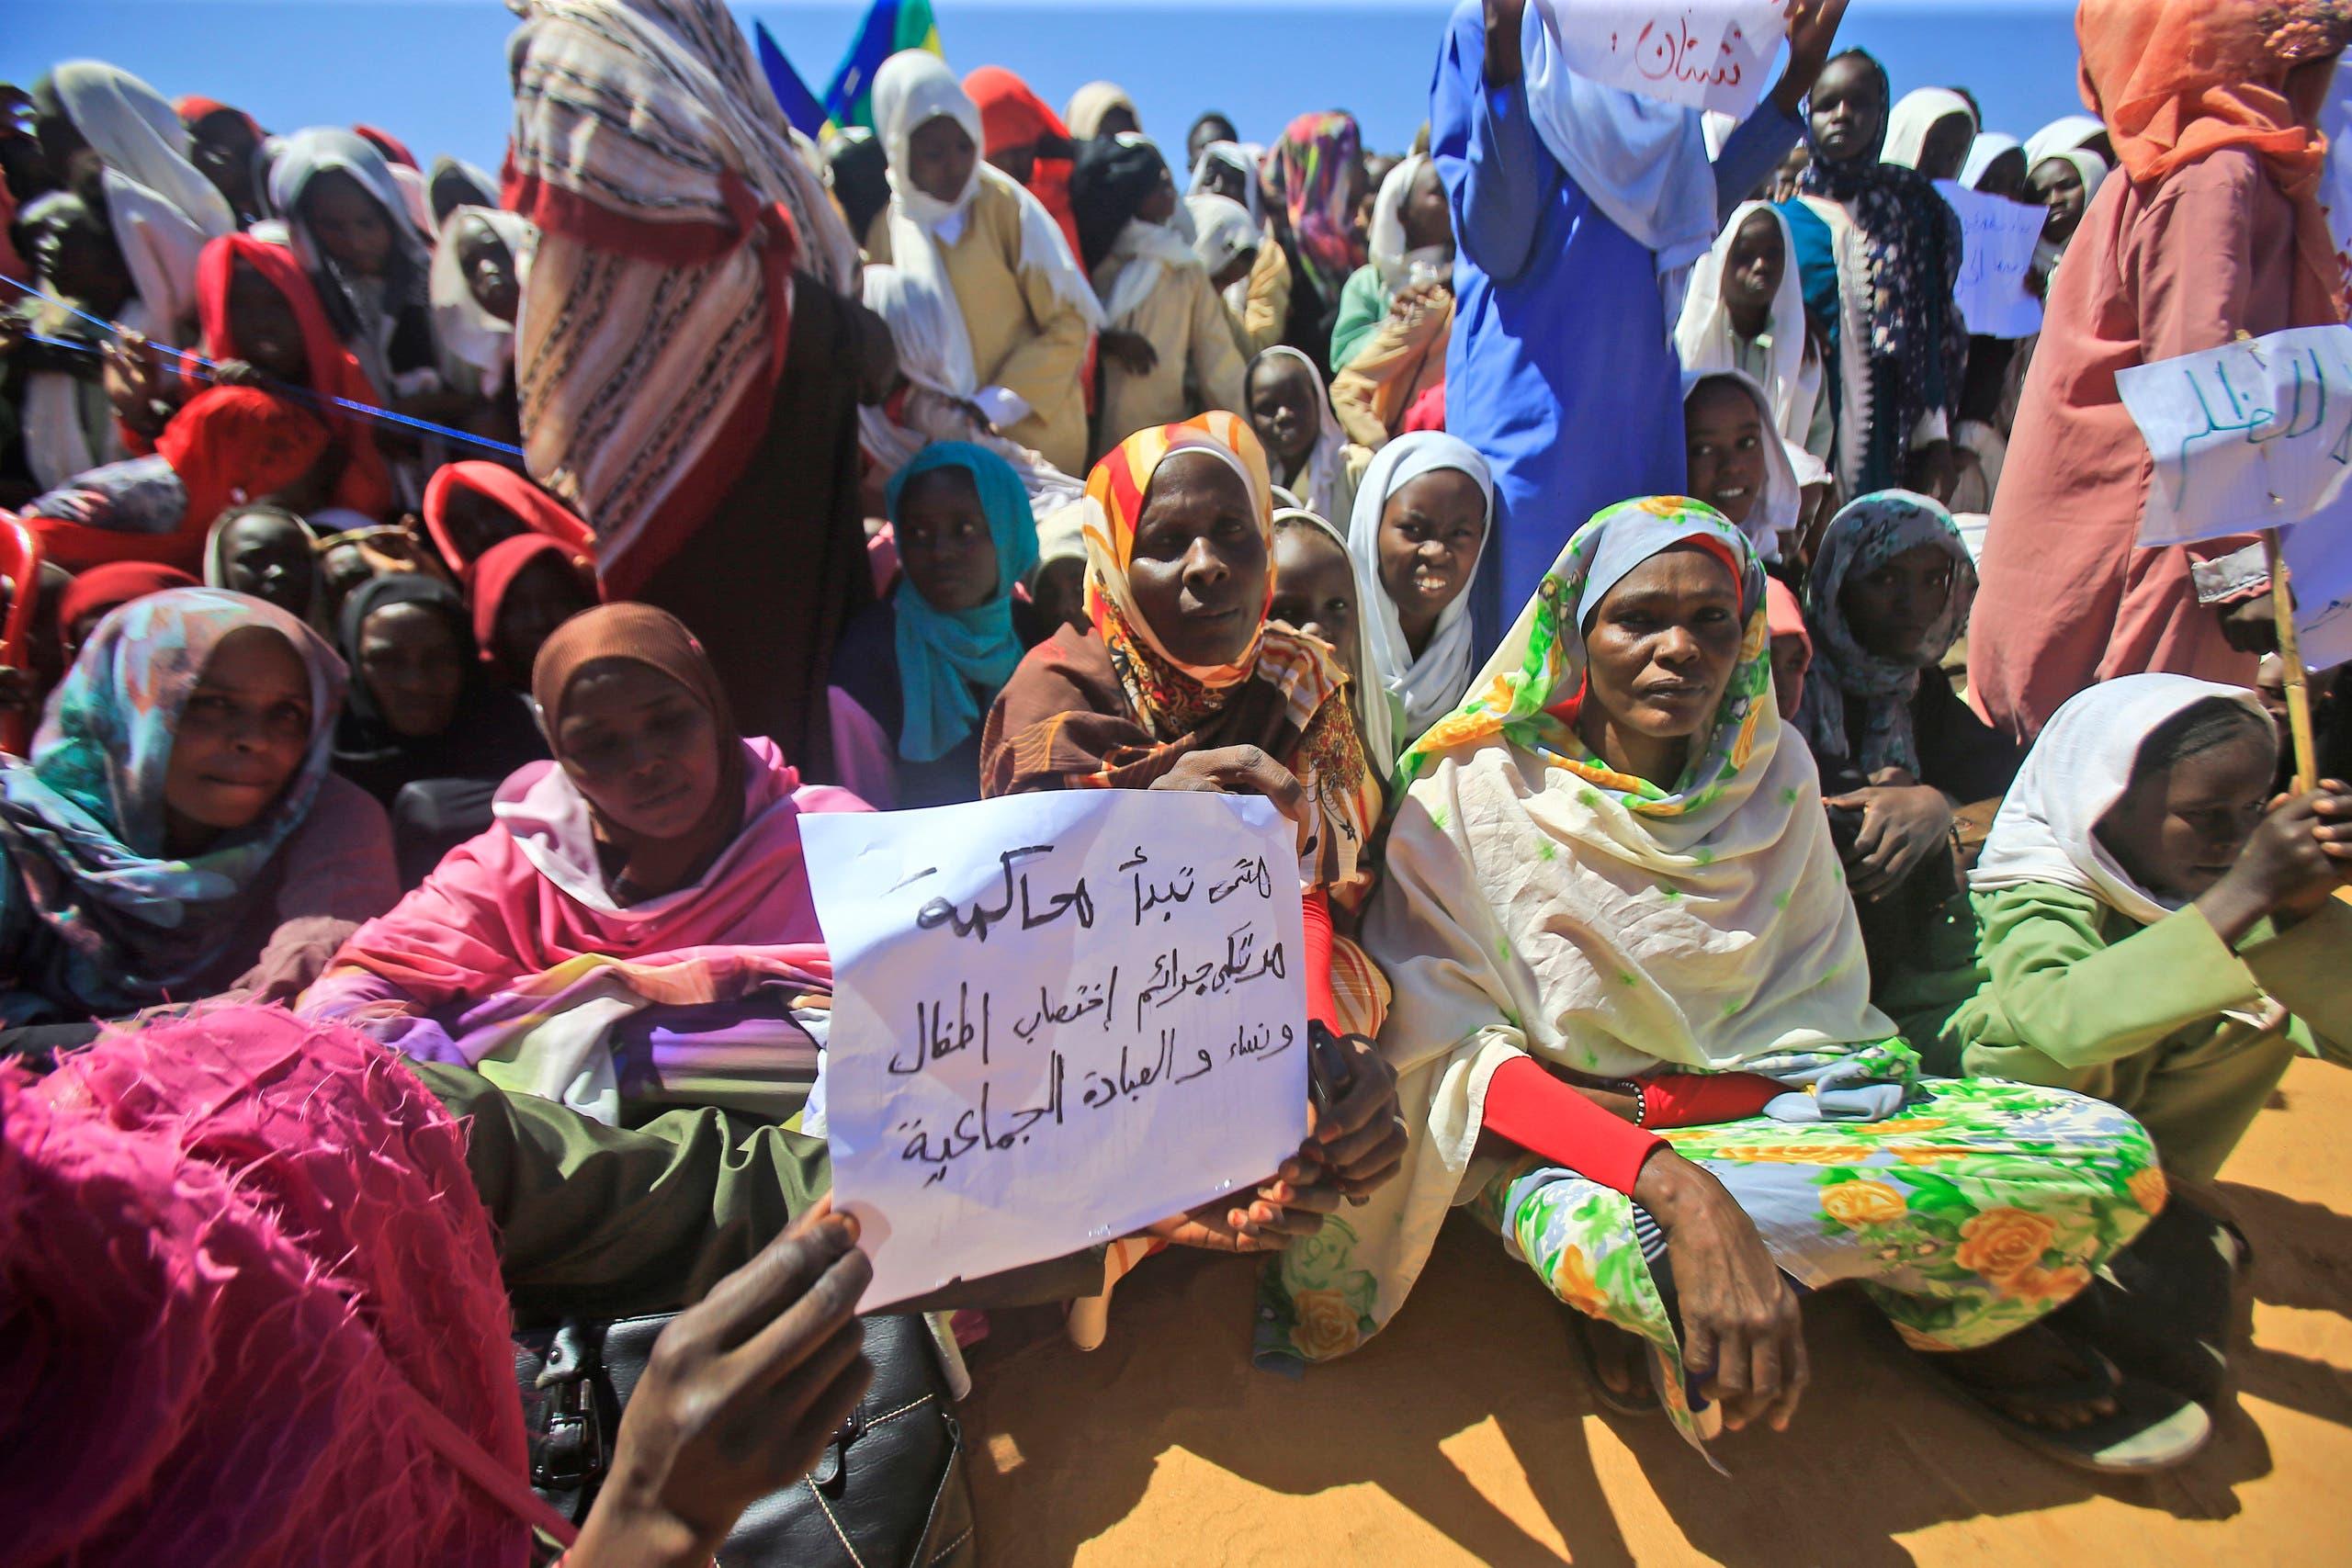 ضحايا نزاع دارفور ينتظرون حمدوك